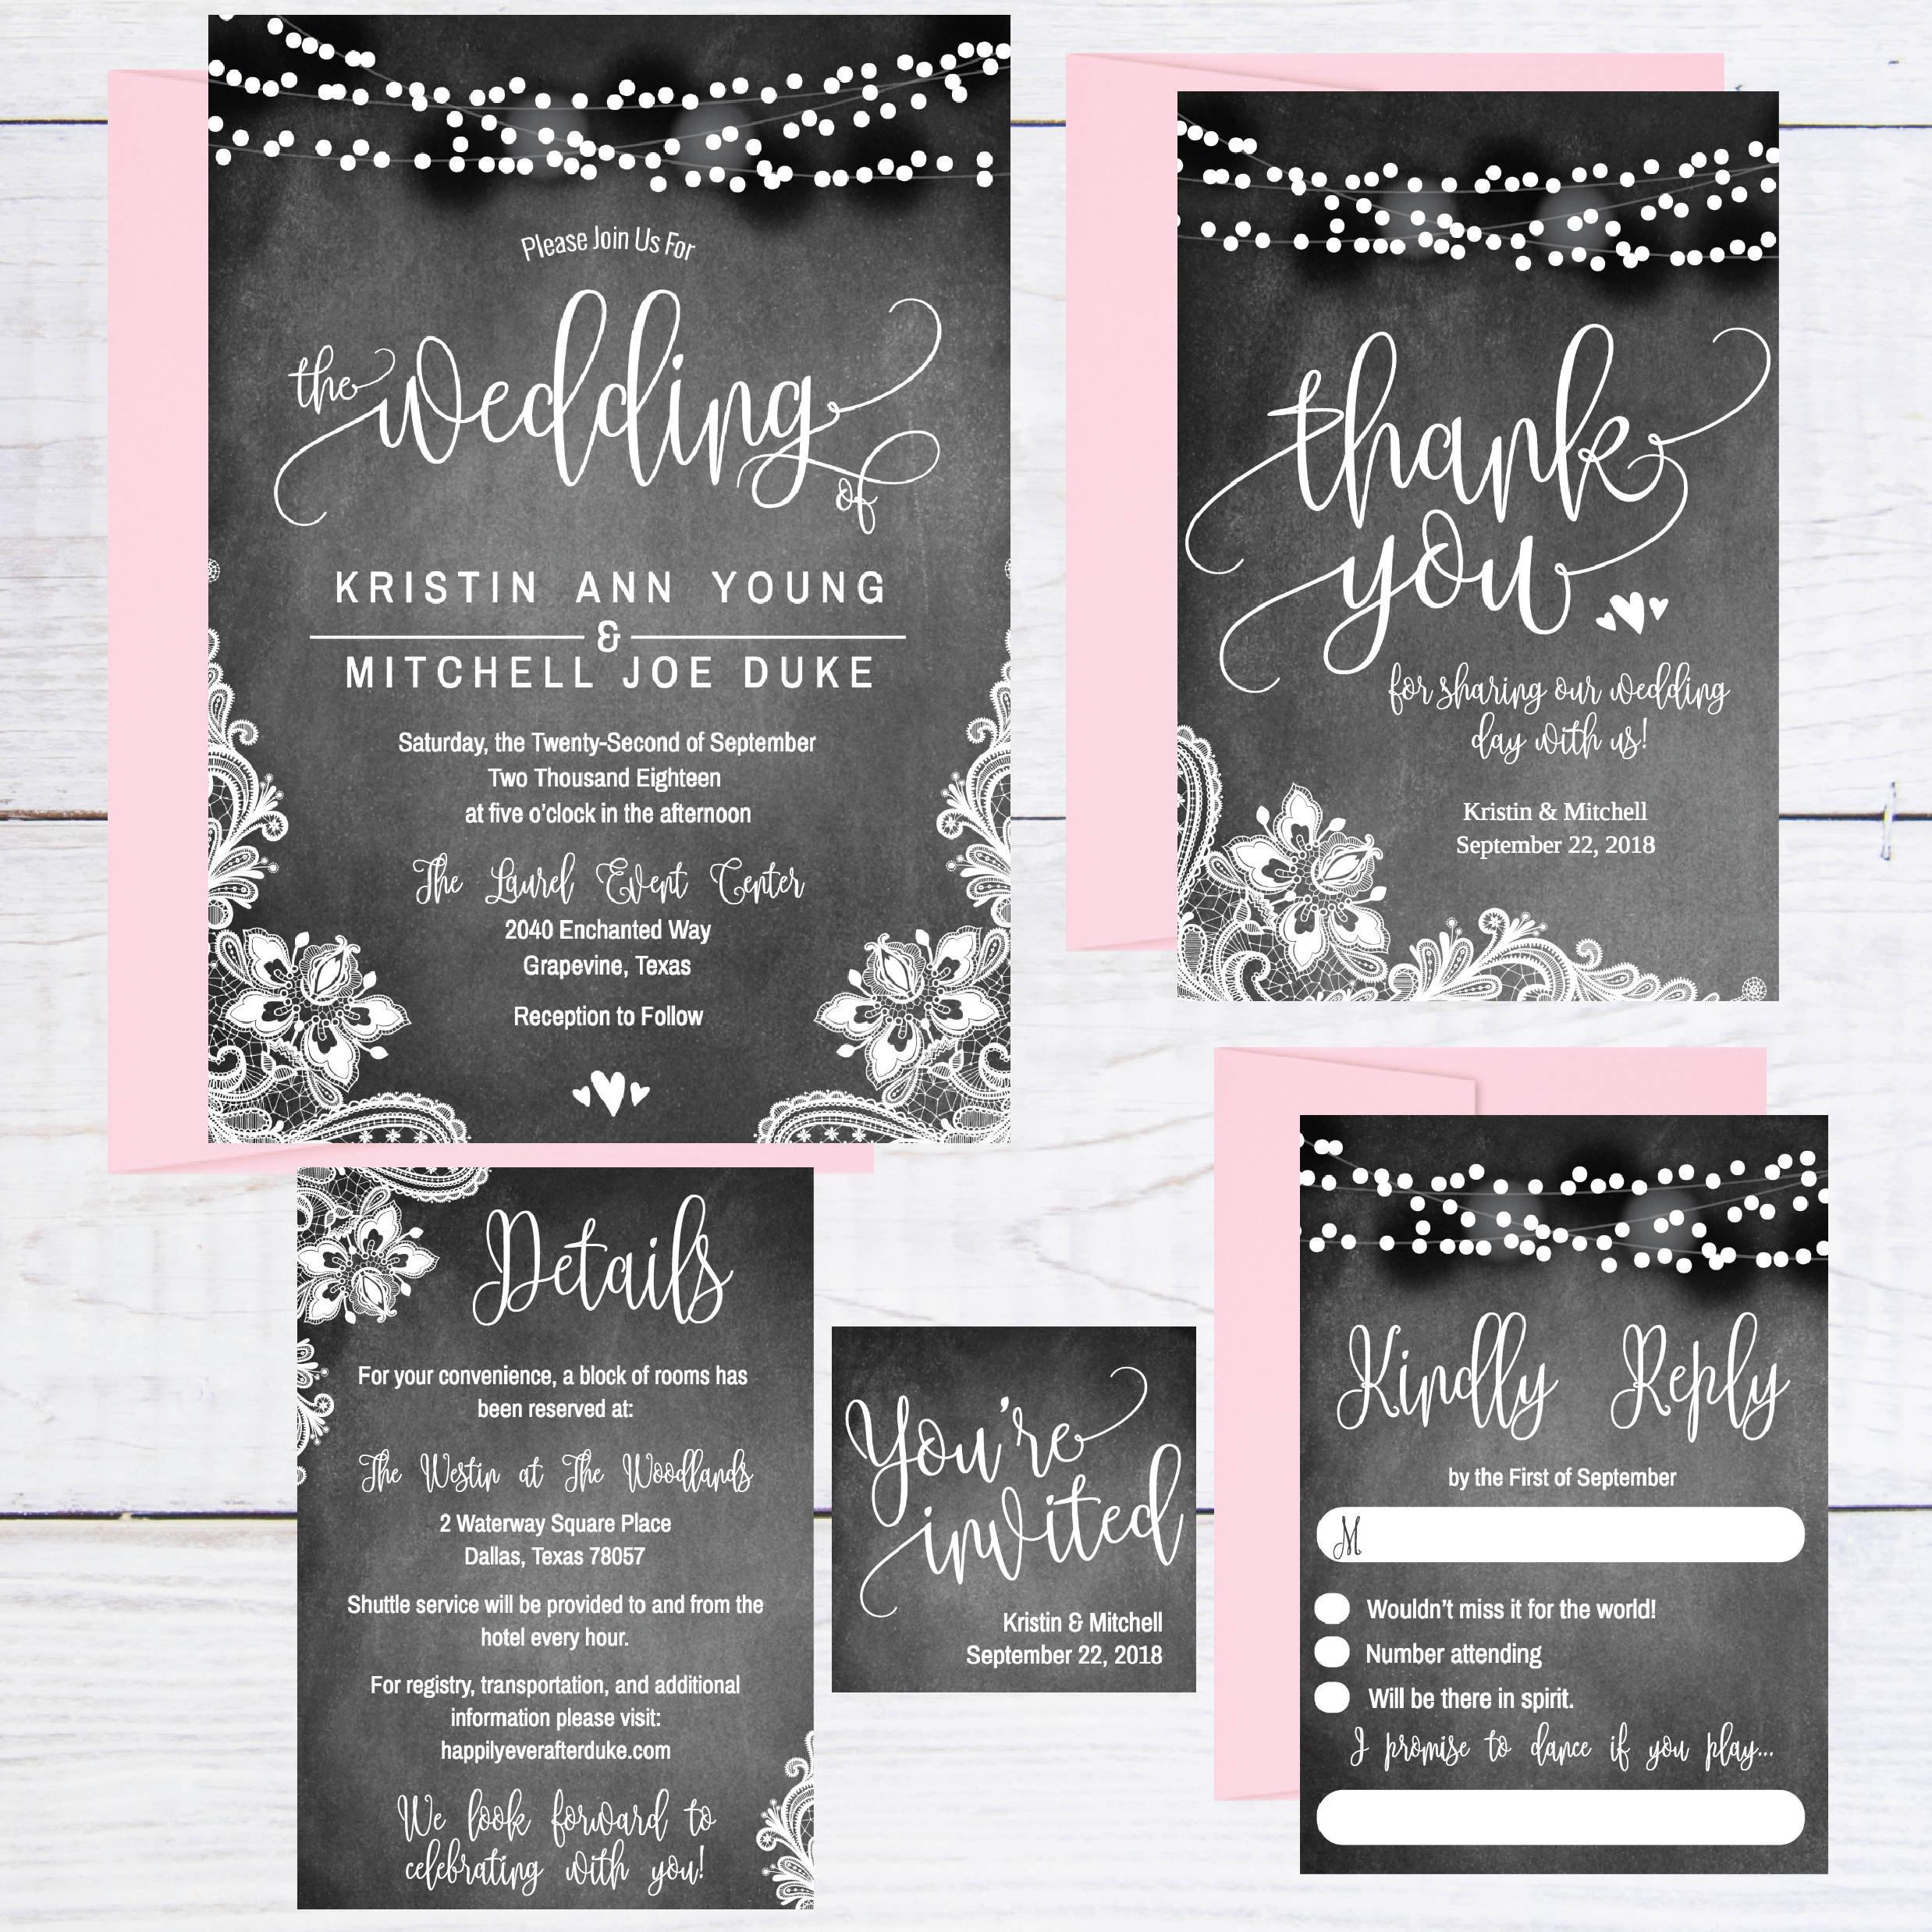 Chalkboard Wedding Invitation Template: Chalkboard Lace & Lights Wedding Invitation Template